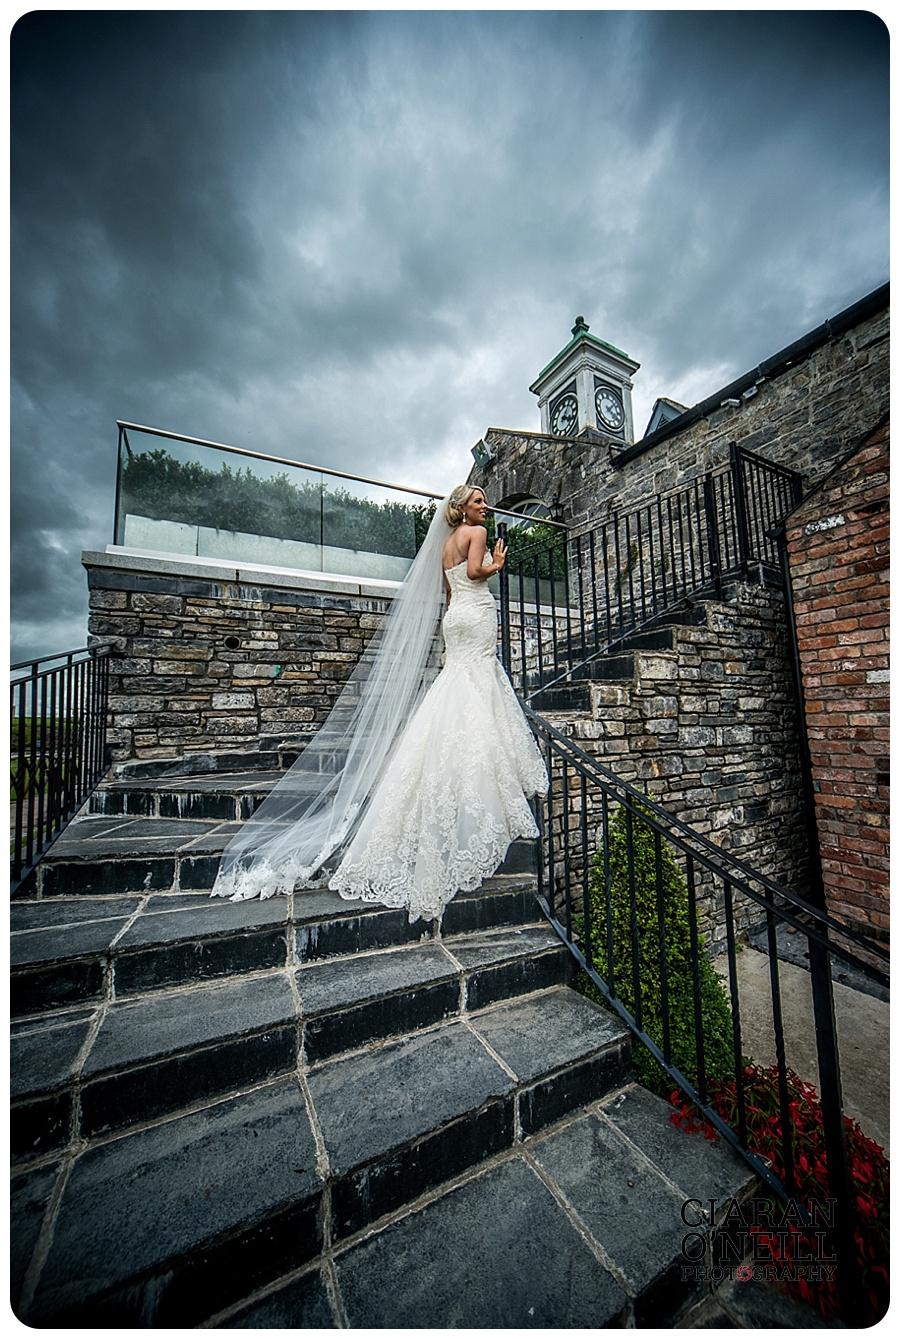 Kelly & Aodhan's wedding at Ballymagarvey Village by Ciaran O'Neill Photography 17